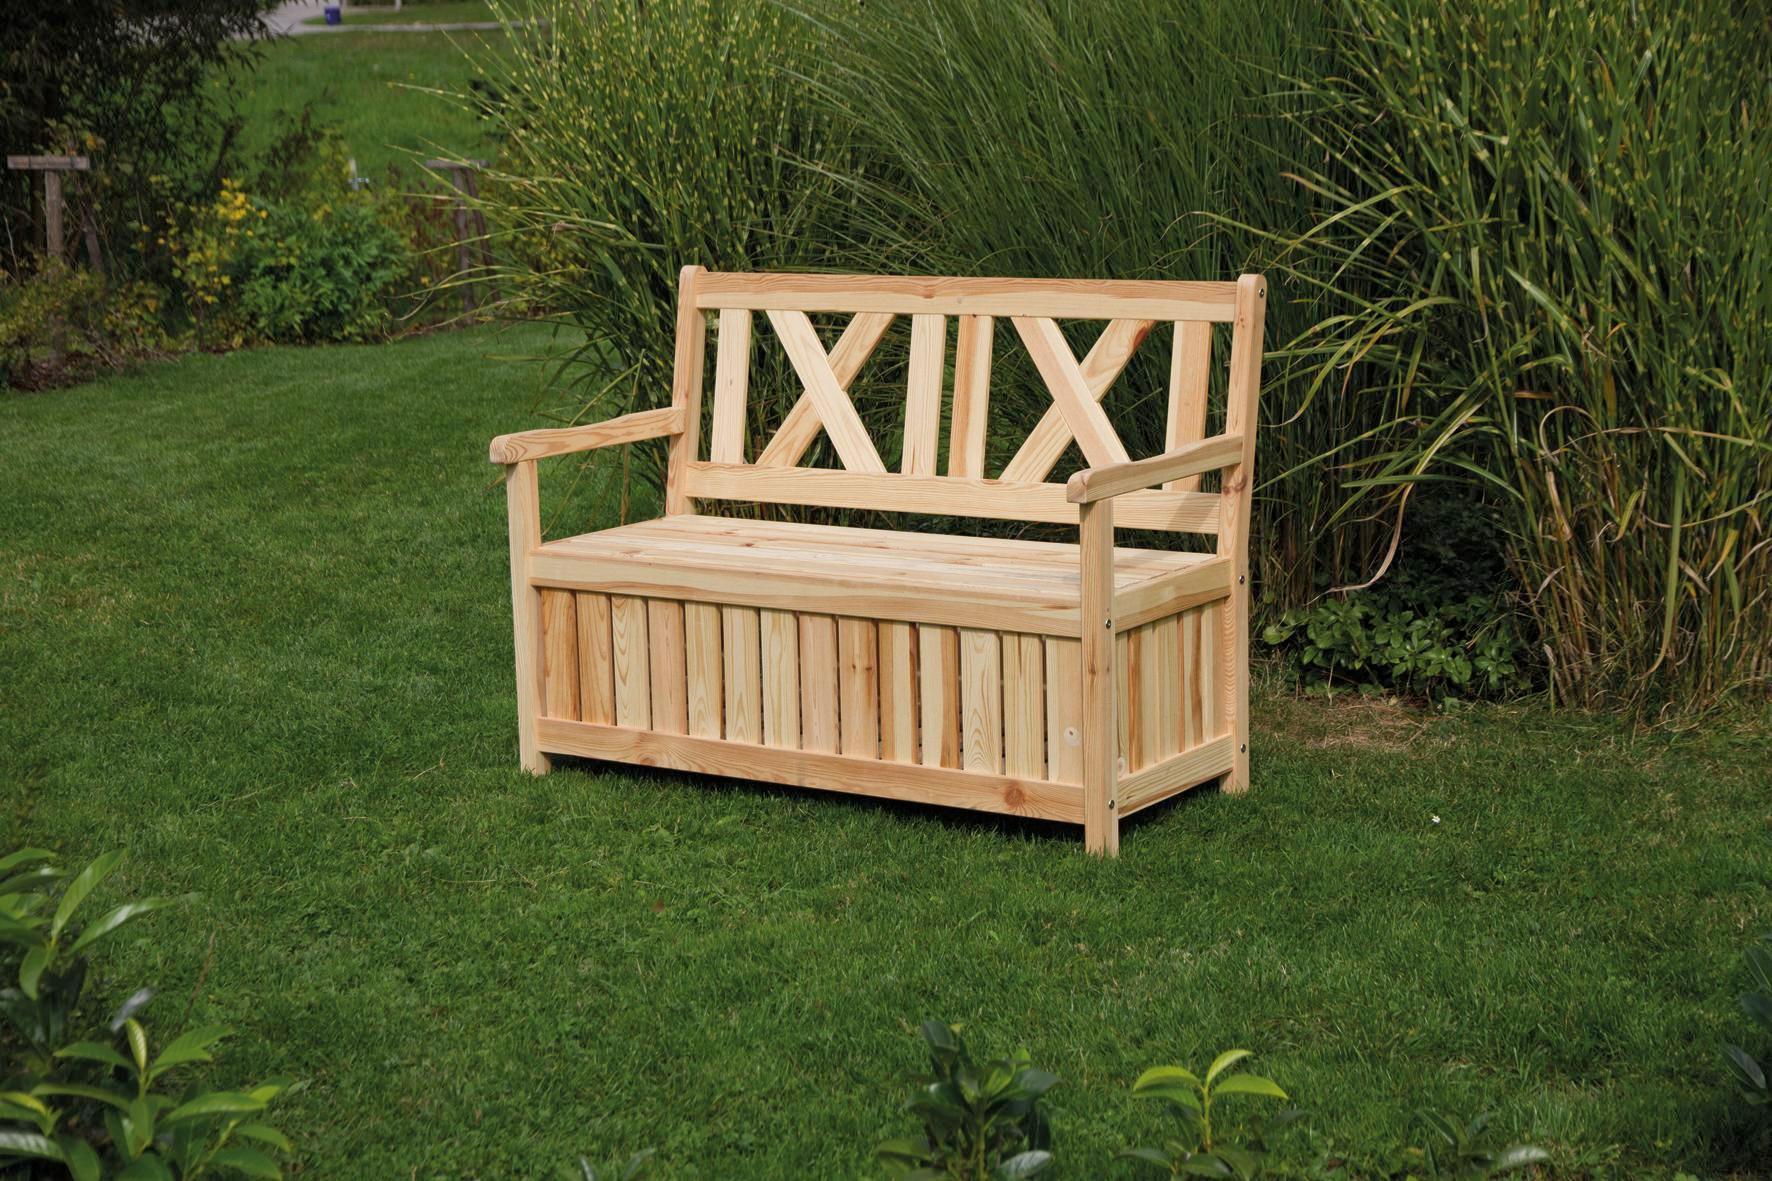 gartenbank-thor-kieferfarben-modern-holz Tolle Gartenbank Holz Ohne Armlehne Design-ideen